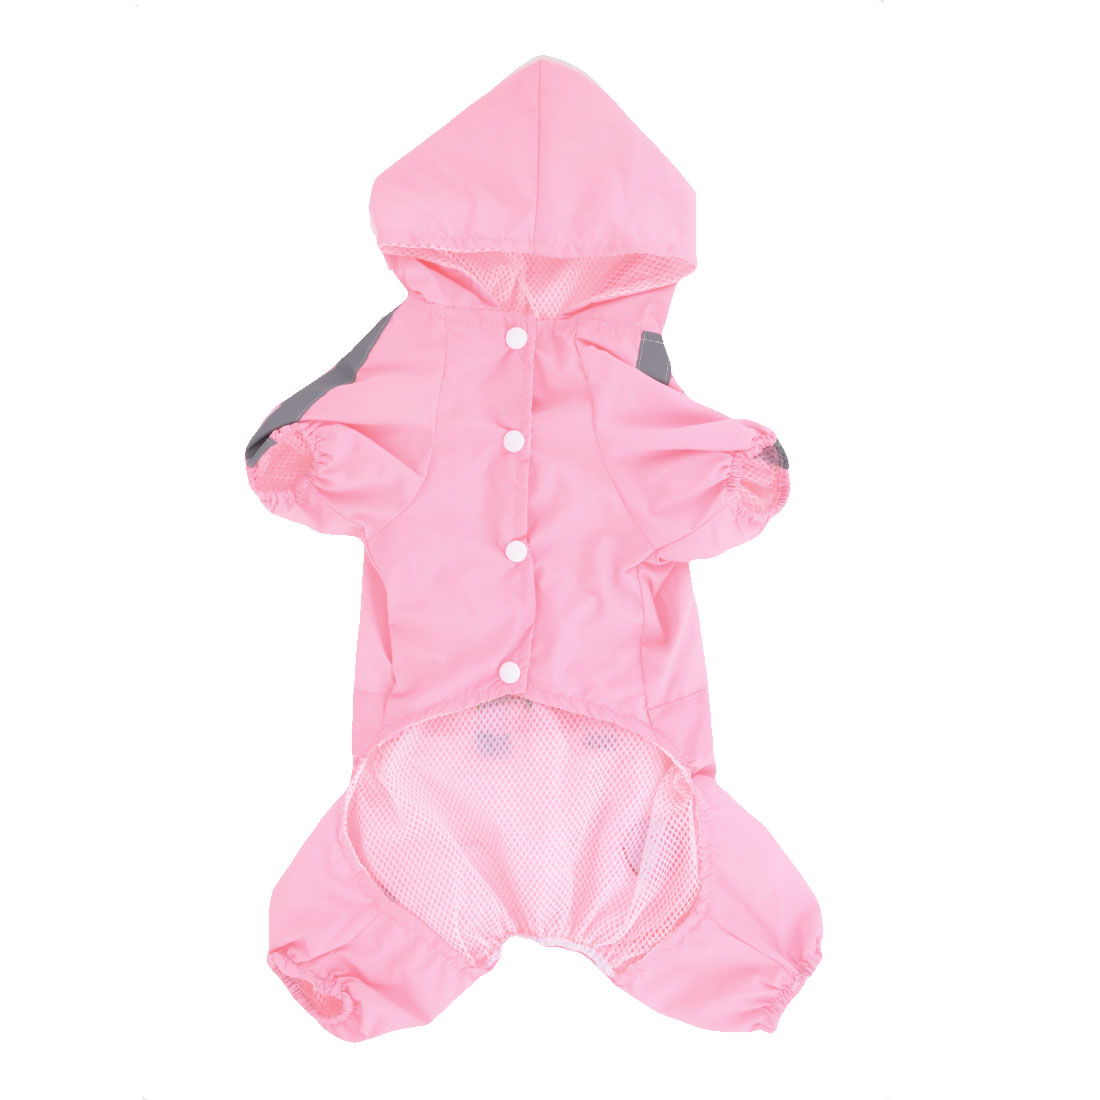 Pet Dog Yorkie Single Breasted Hooded Raincoat Poncho Rainwear Pink XS